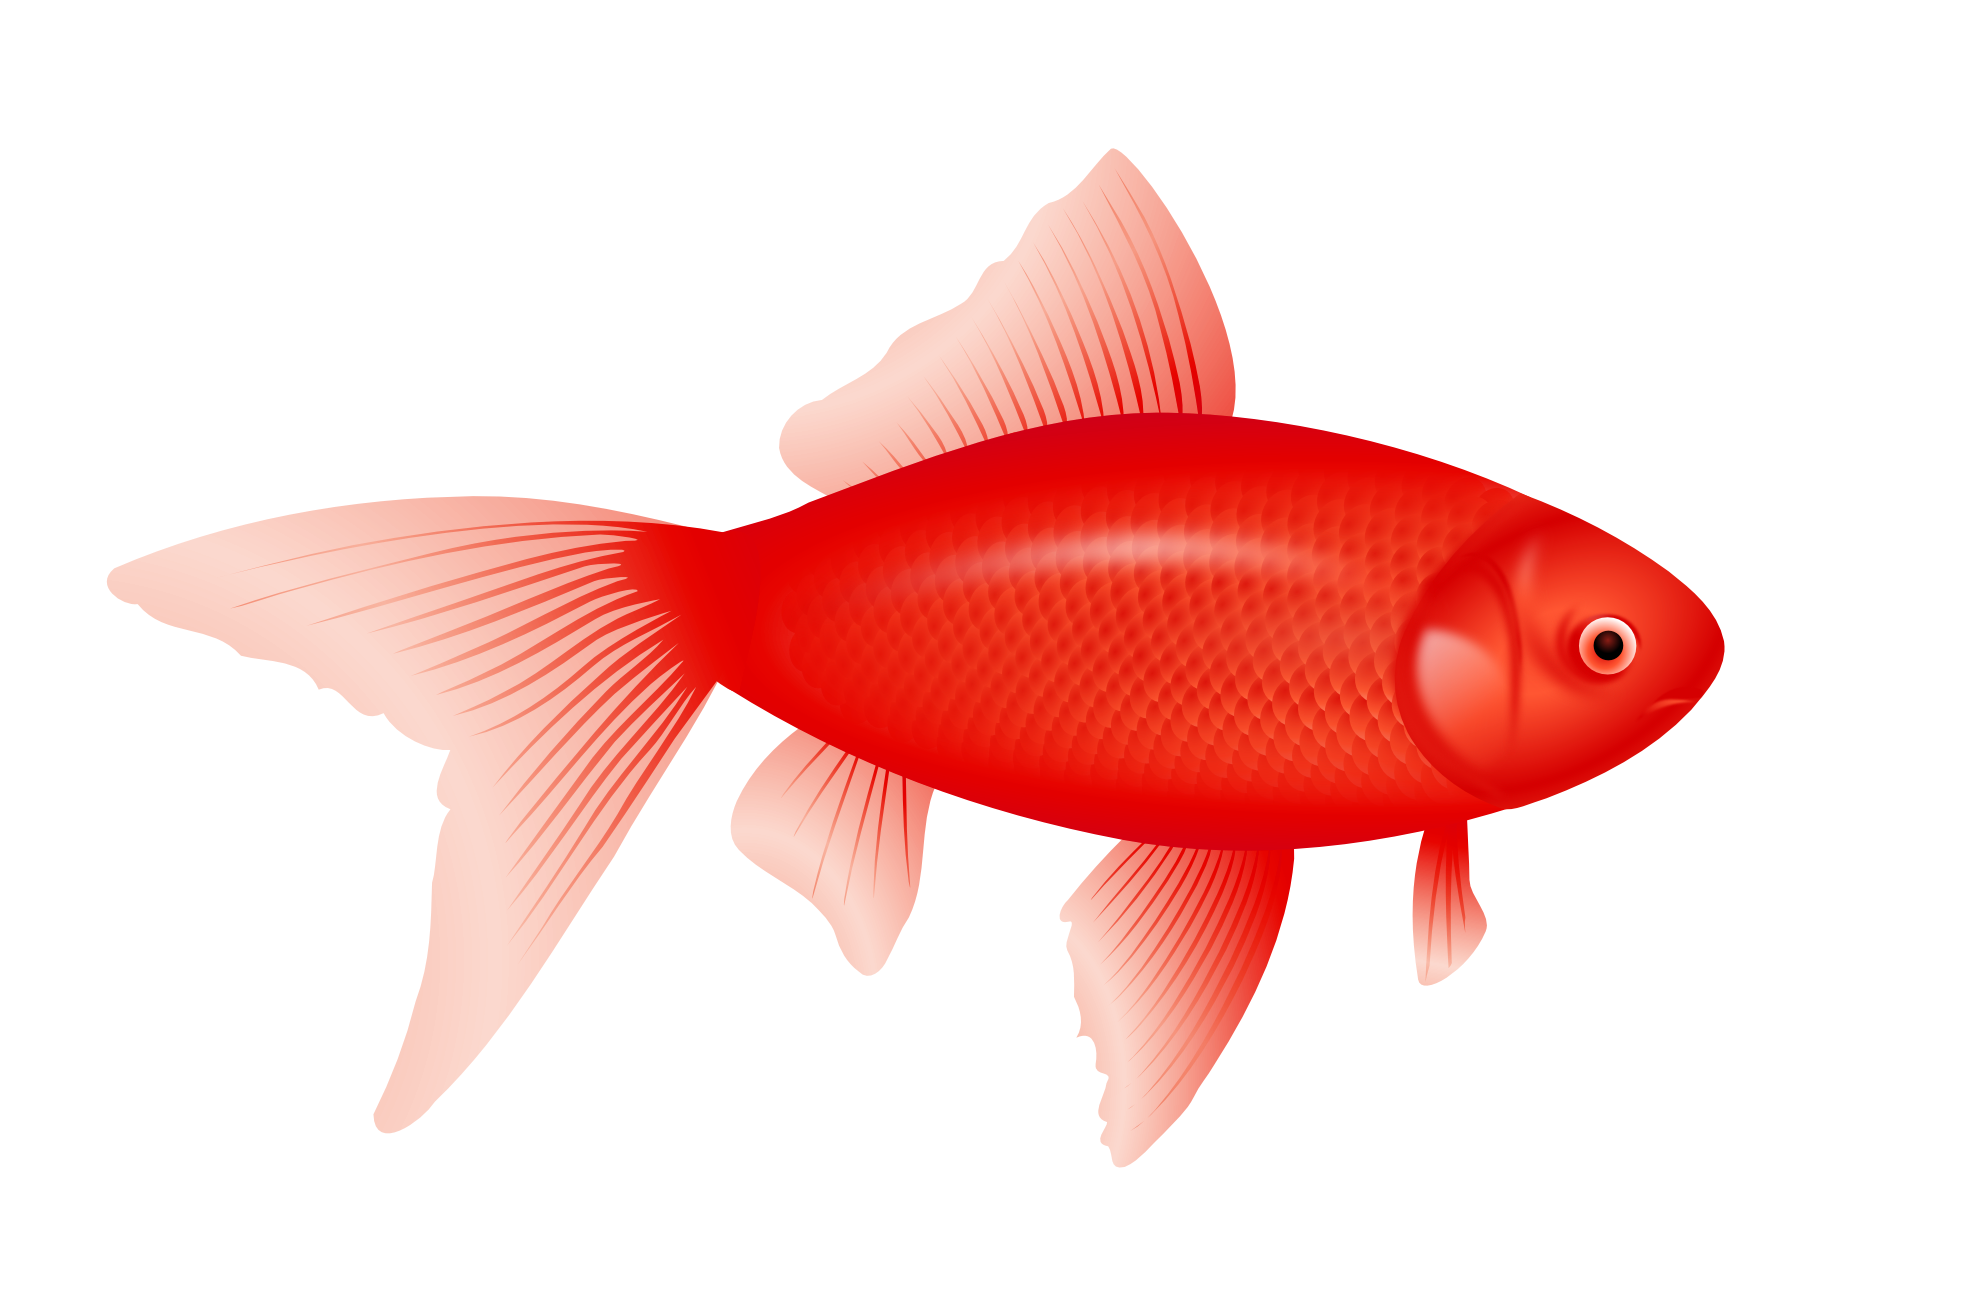 Sad fish clipart vector free download red fish clipart redfish trout flounder clipart 9 - Clip Art. Net vector free download